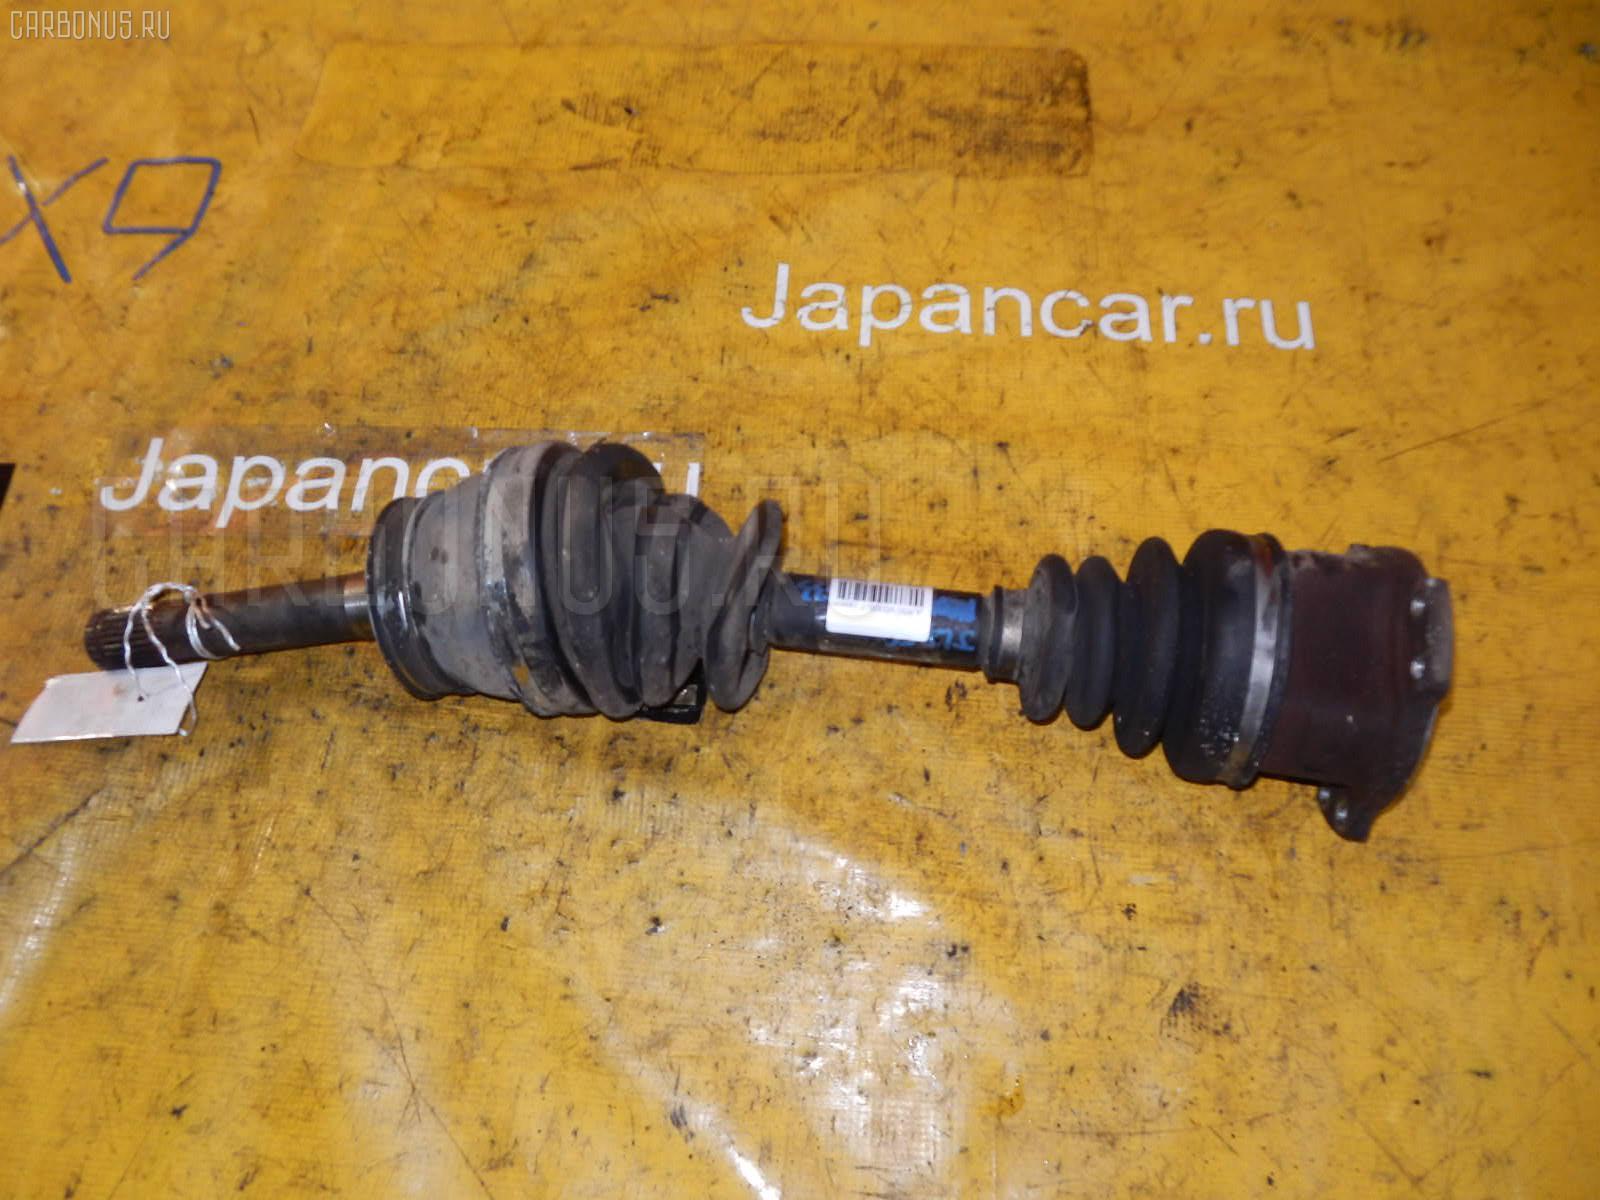 Привод Nissan Terrano regulus JLR50 VG33E Фото 1